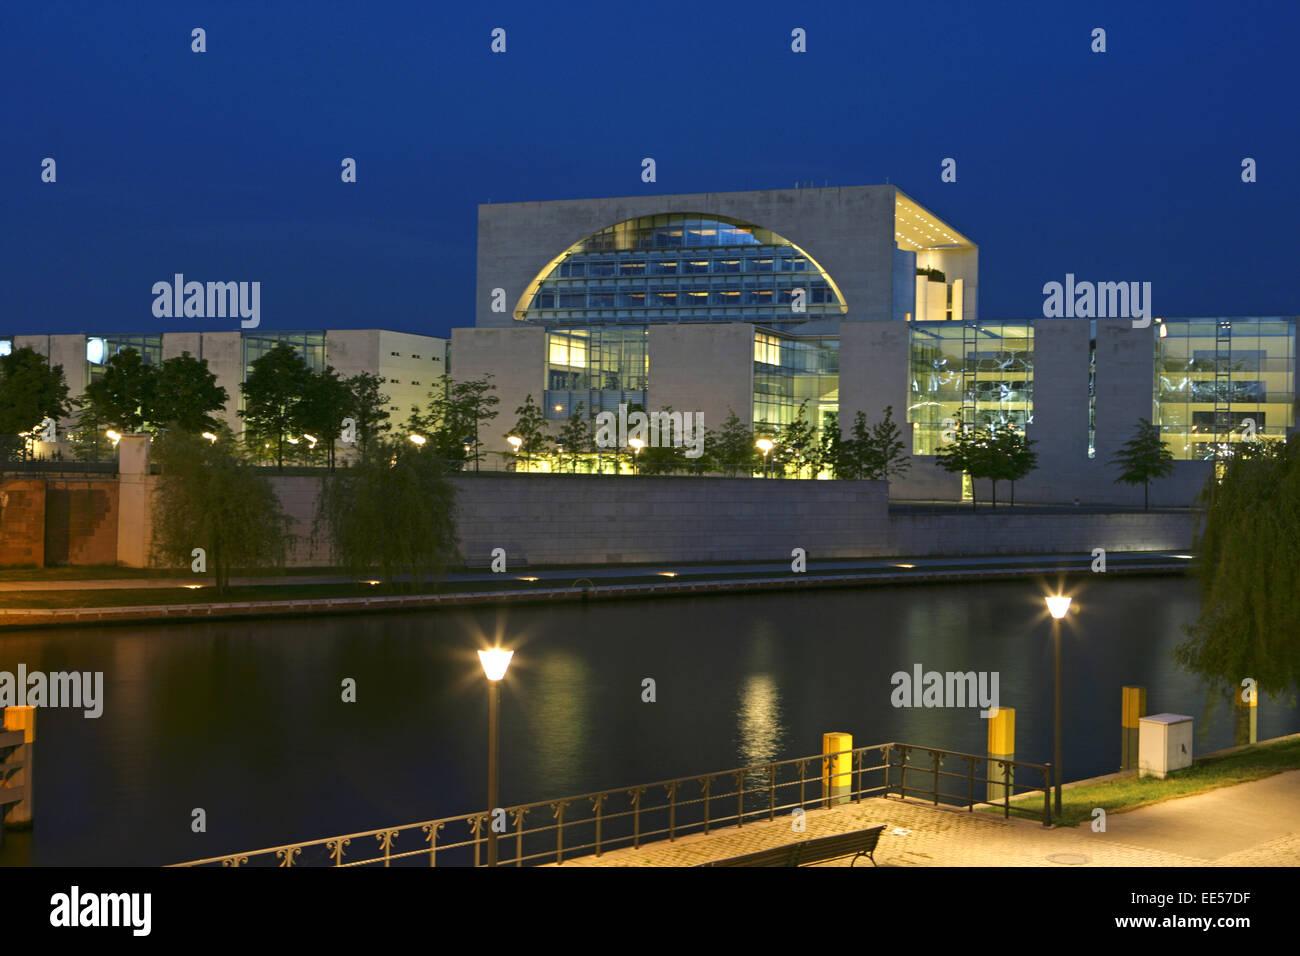 Deutschland, Berlin, Europa, Hauptstadt, Stadt, Sehenswuerdigkeit, Berlin-Tiergarten, neues Bundeskanzleramt, Willy - Stock Image